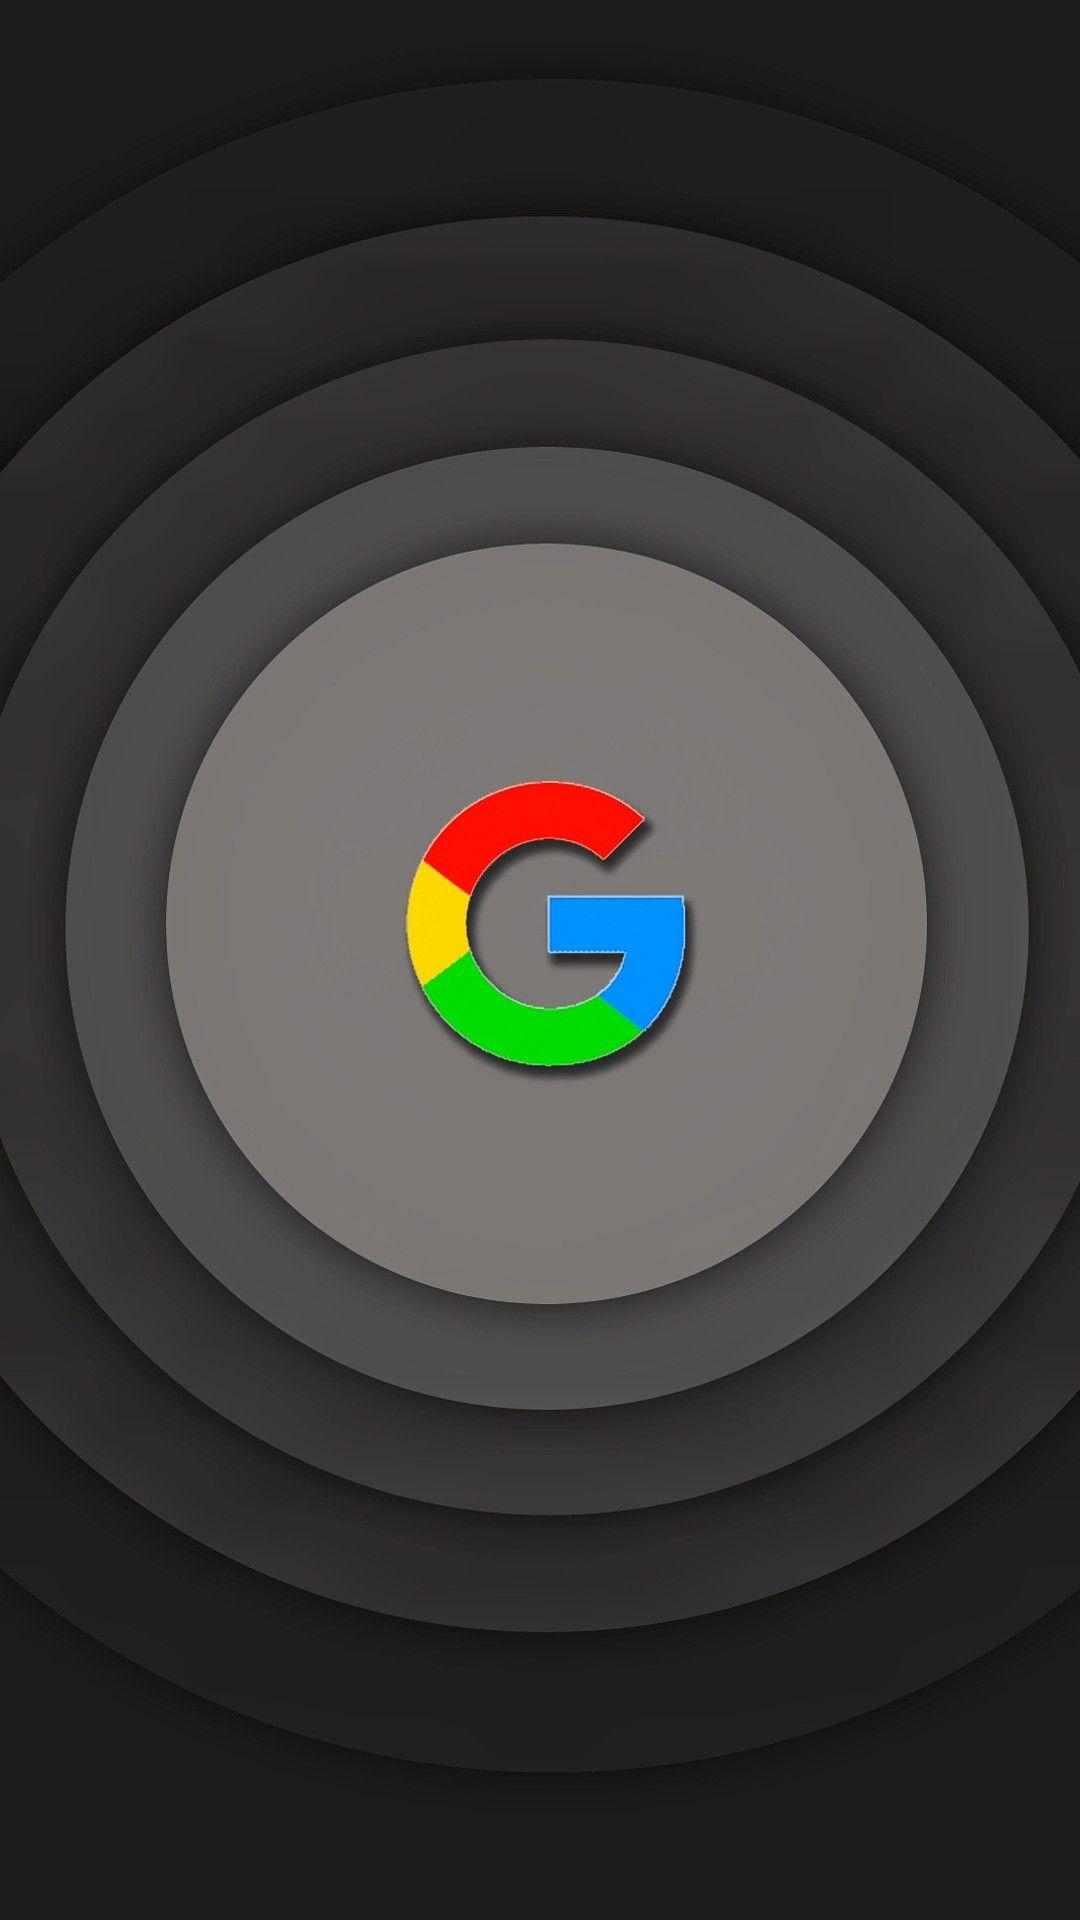 Love Google Posted C By Rhendy Hostta Google Pixel Wallpaper Phone Wallpaper Patterns Cellphone Wallpaper